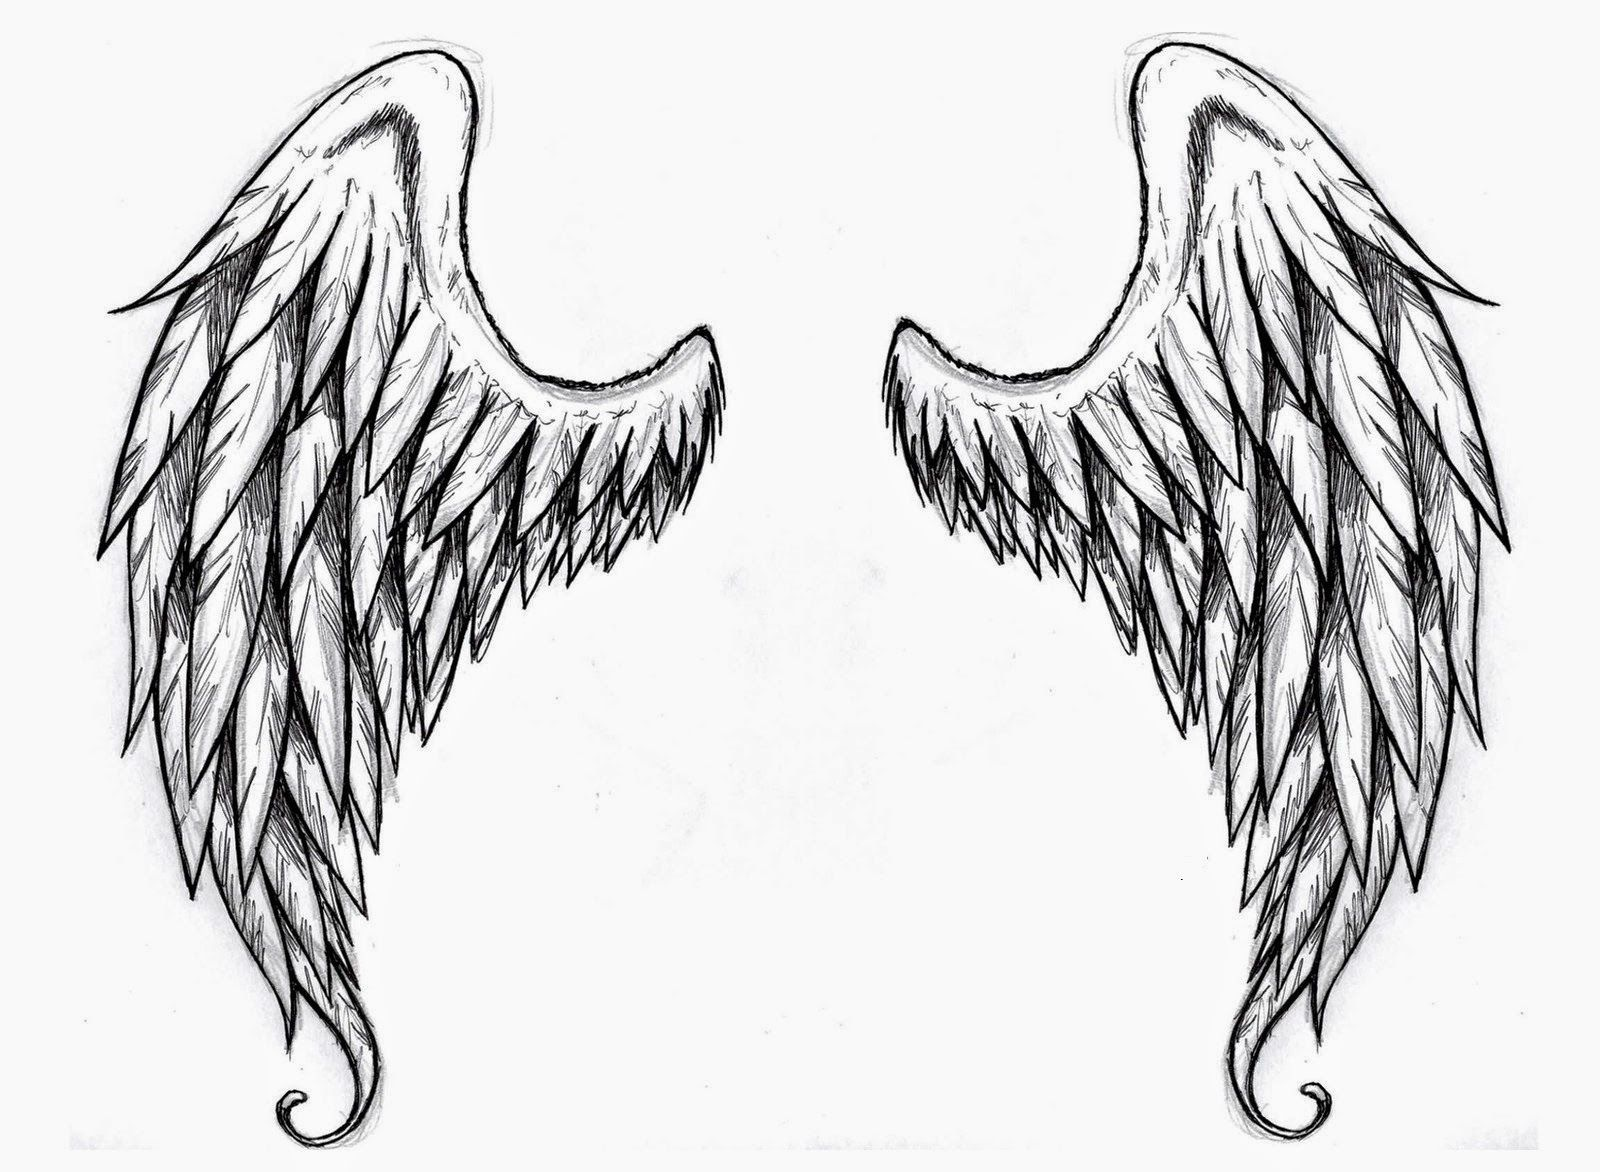 Wings Tattoo Stencilsangel Wings Free Tattoo Stencil - Angel Wings - Free Tattoo Stencils Printable